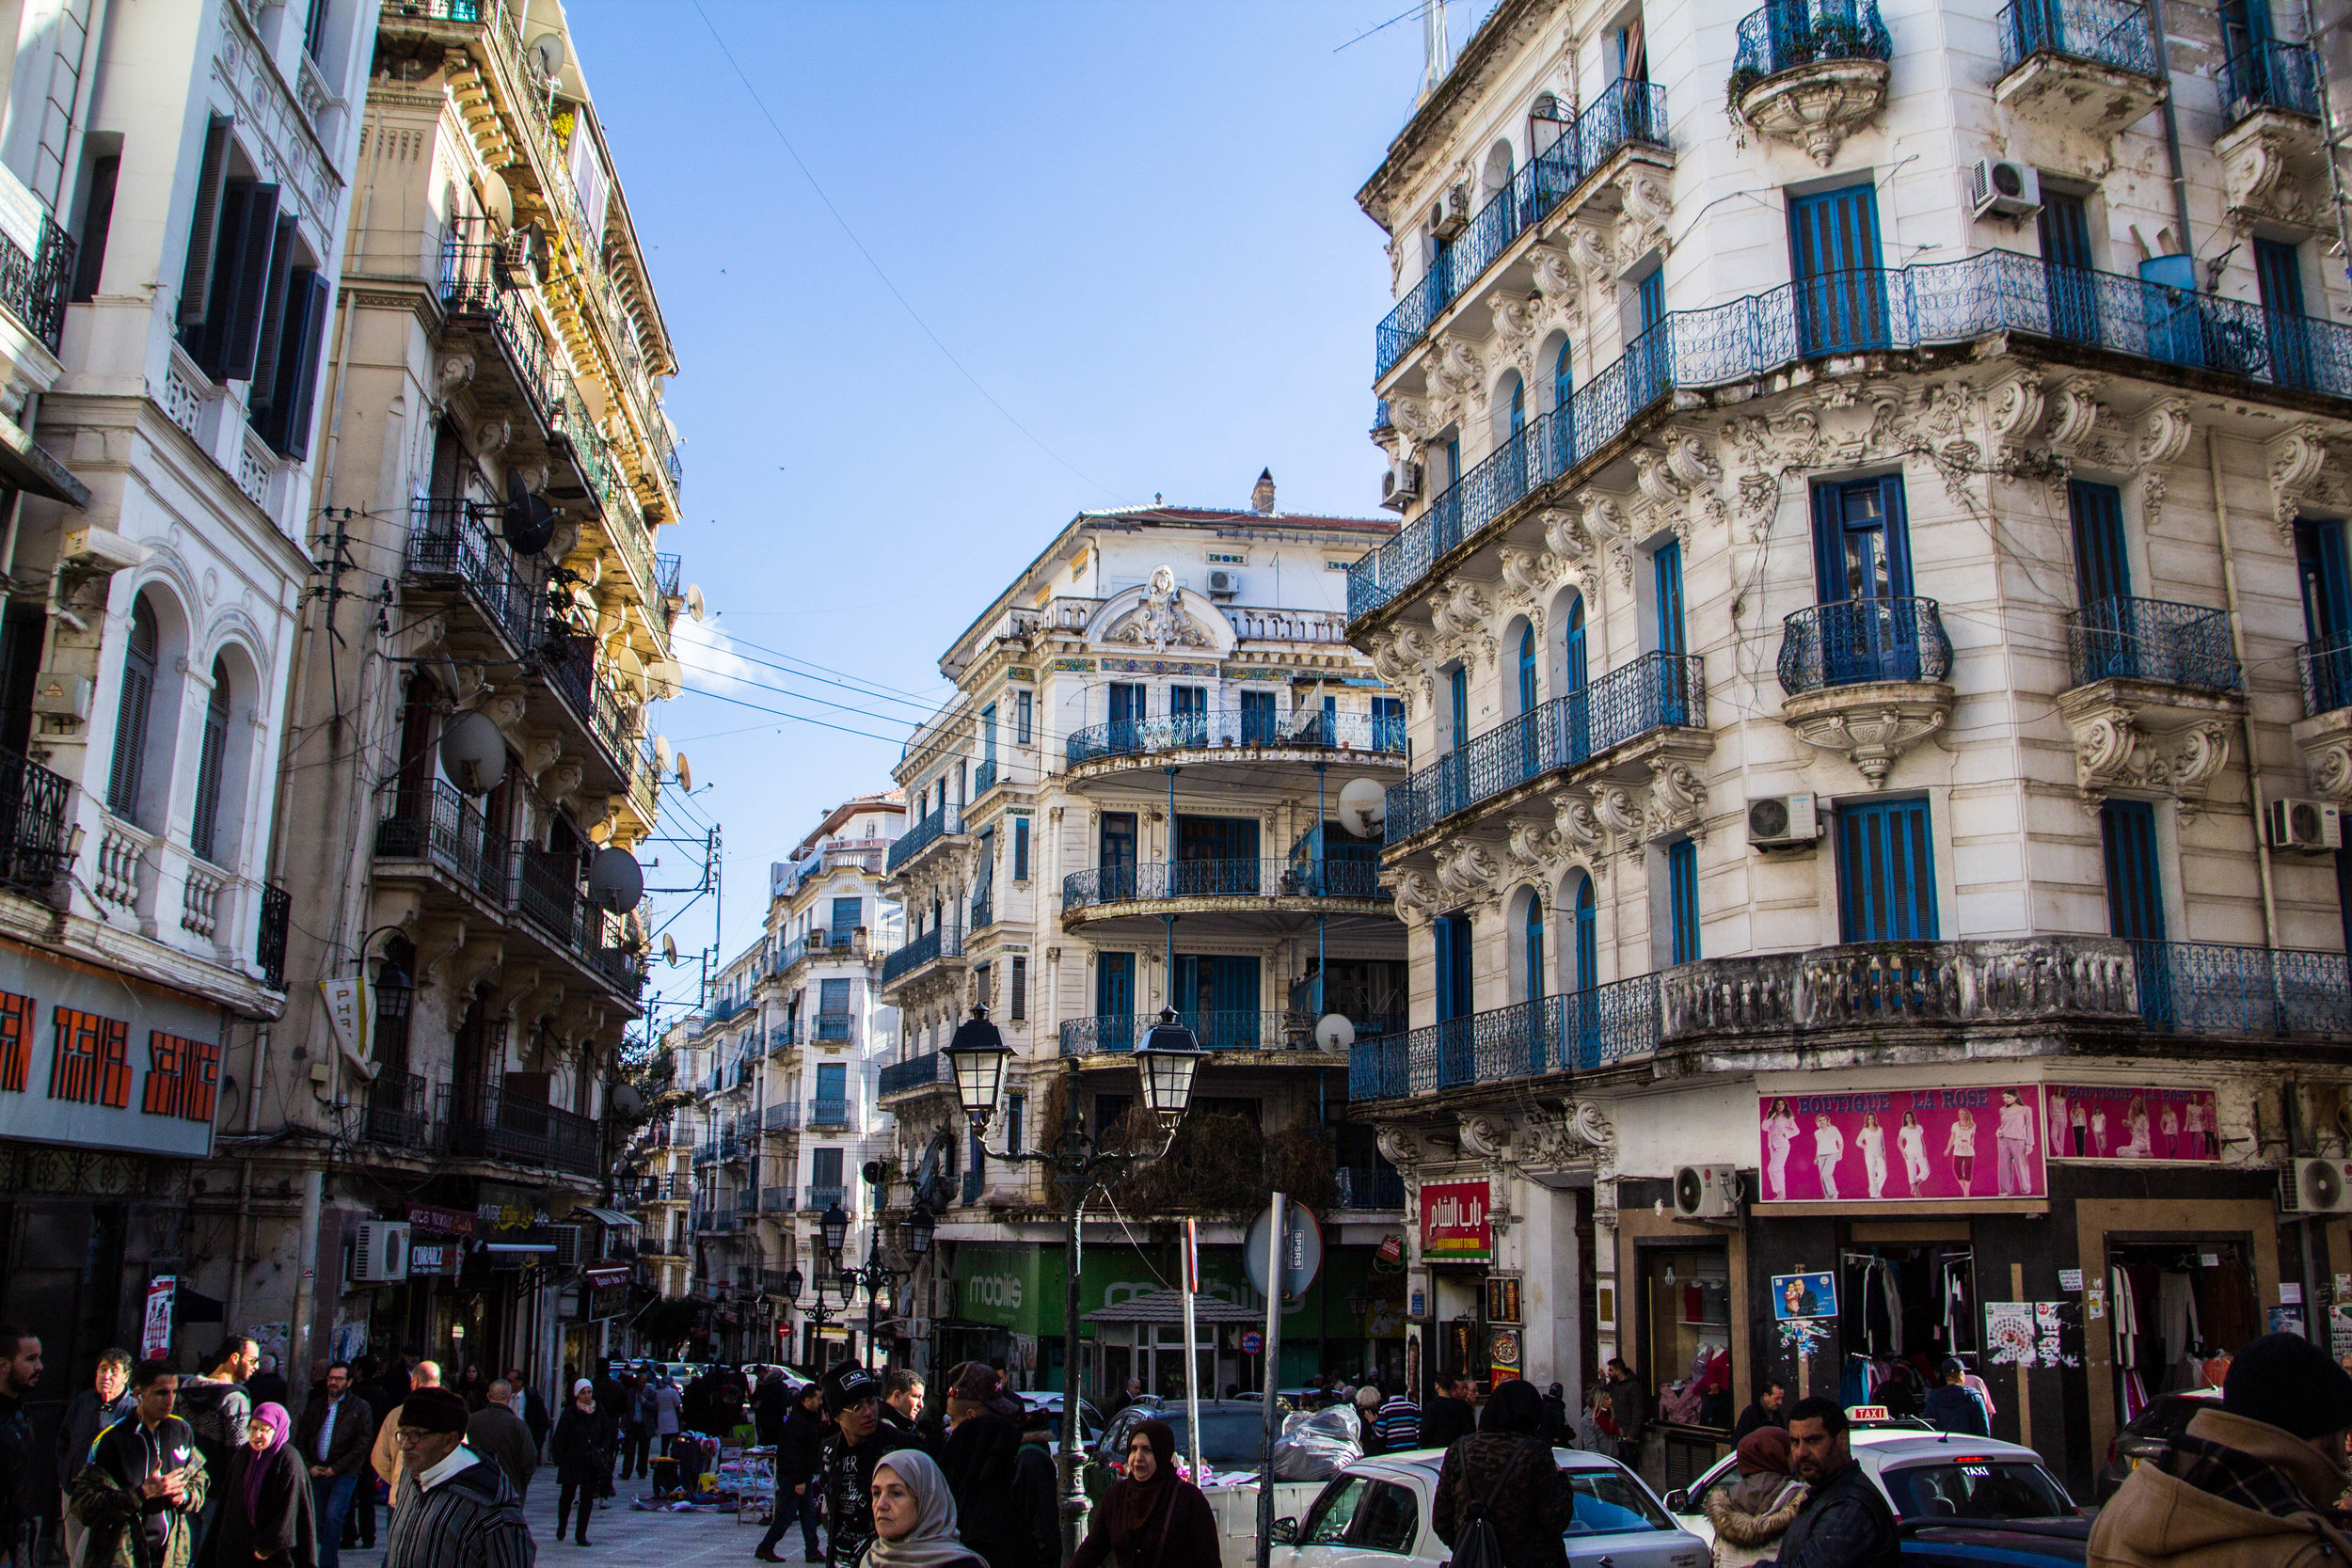 streets-algiers-algeria-25.jpg